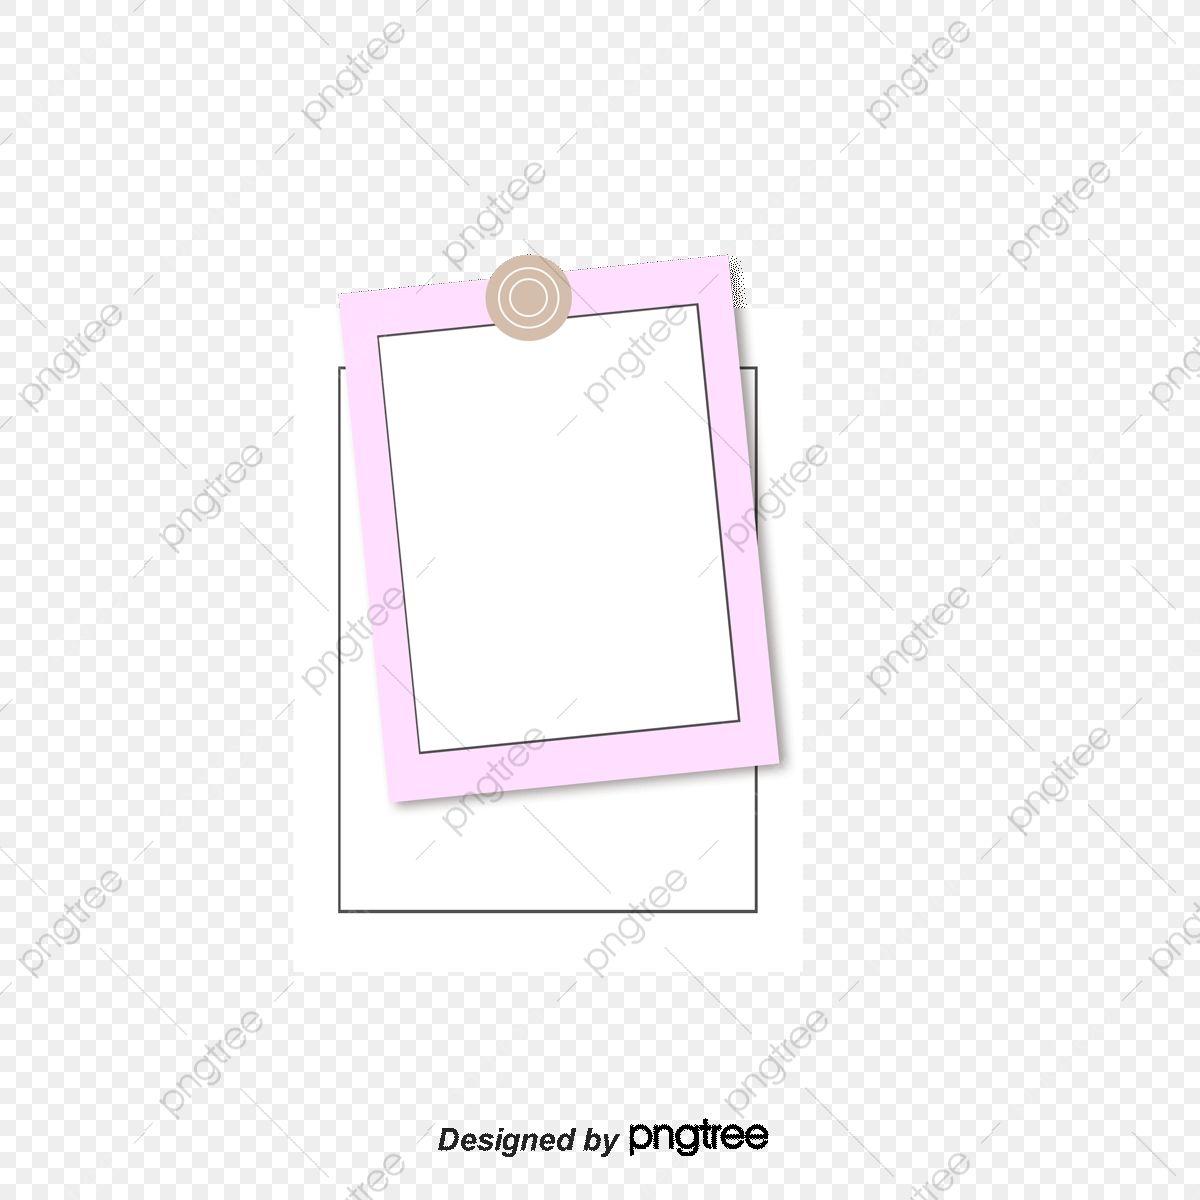 رمز مربع النص رمز مربع النص حوار Png وملف Psd للتحميل مجانا Design Letters Text